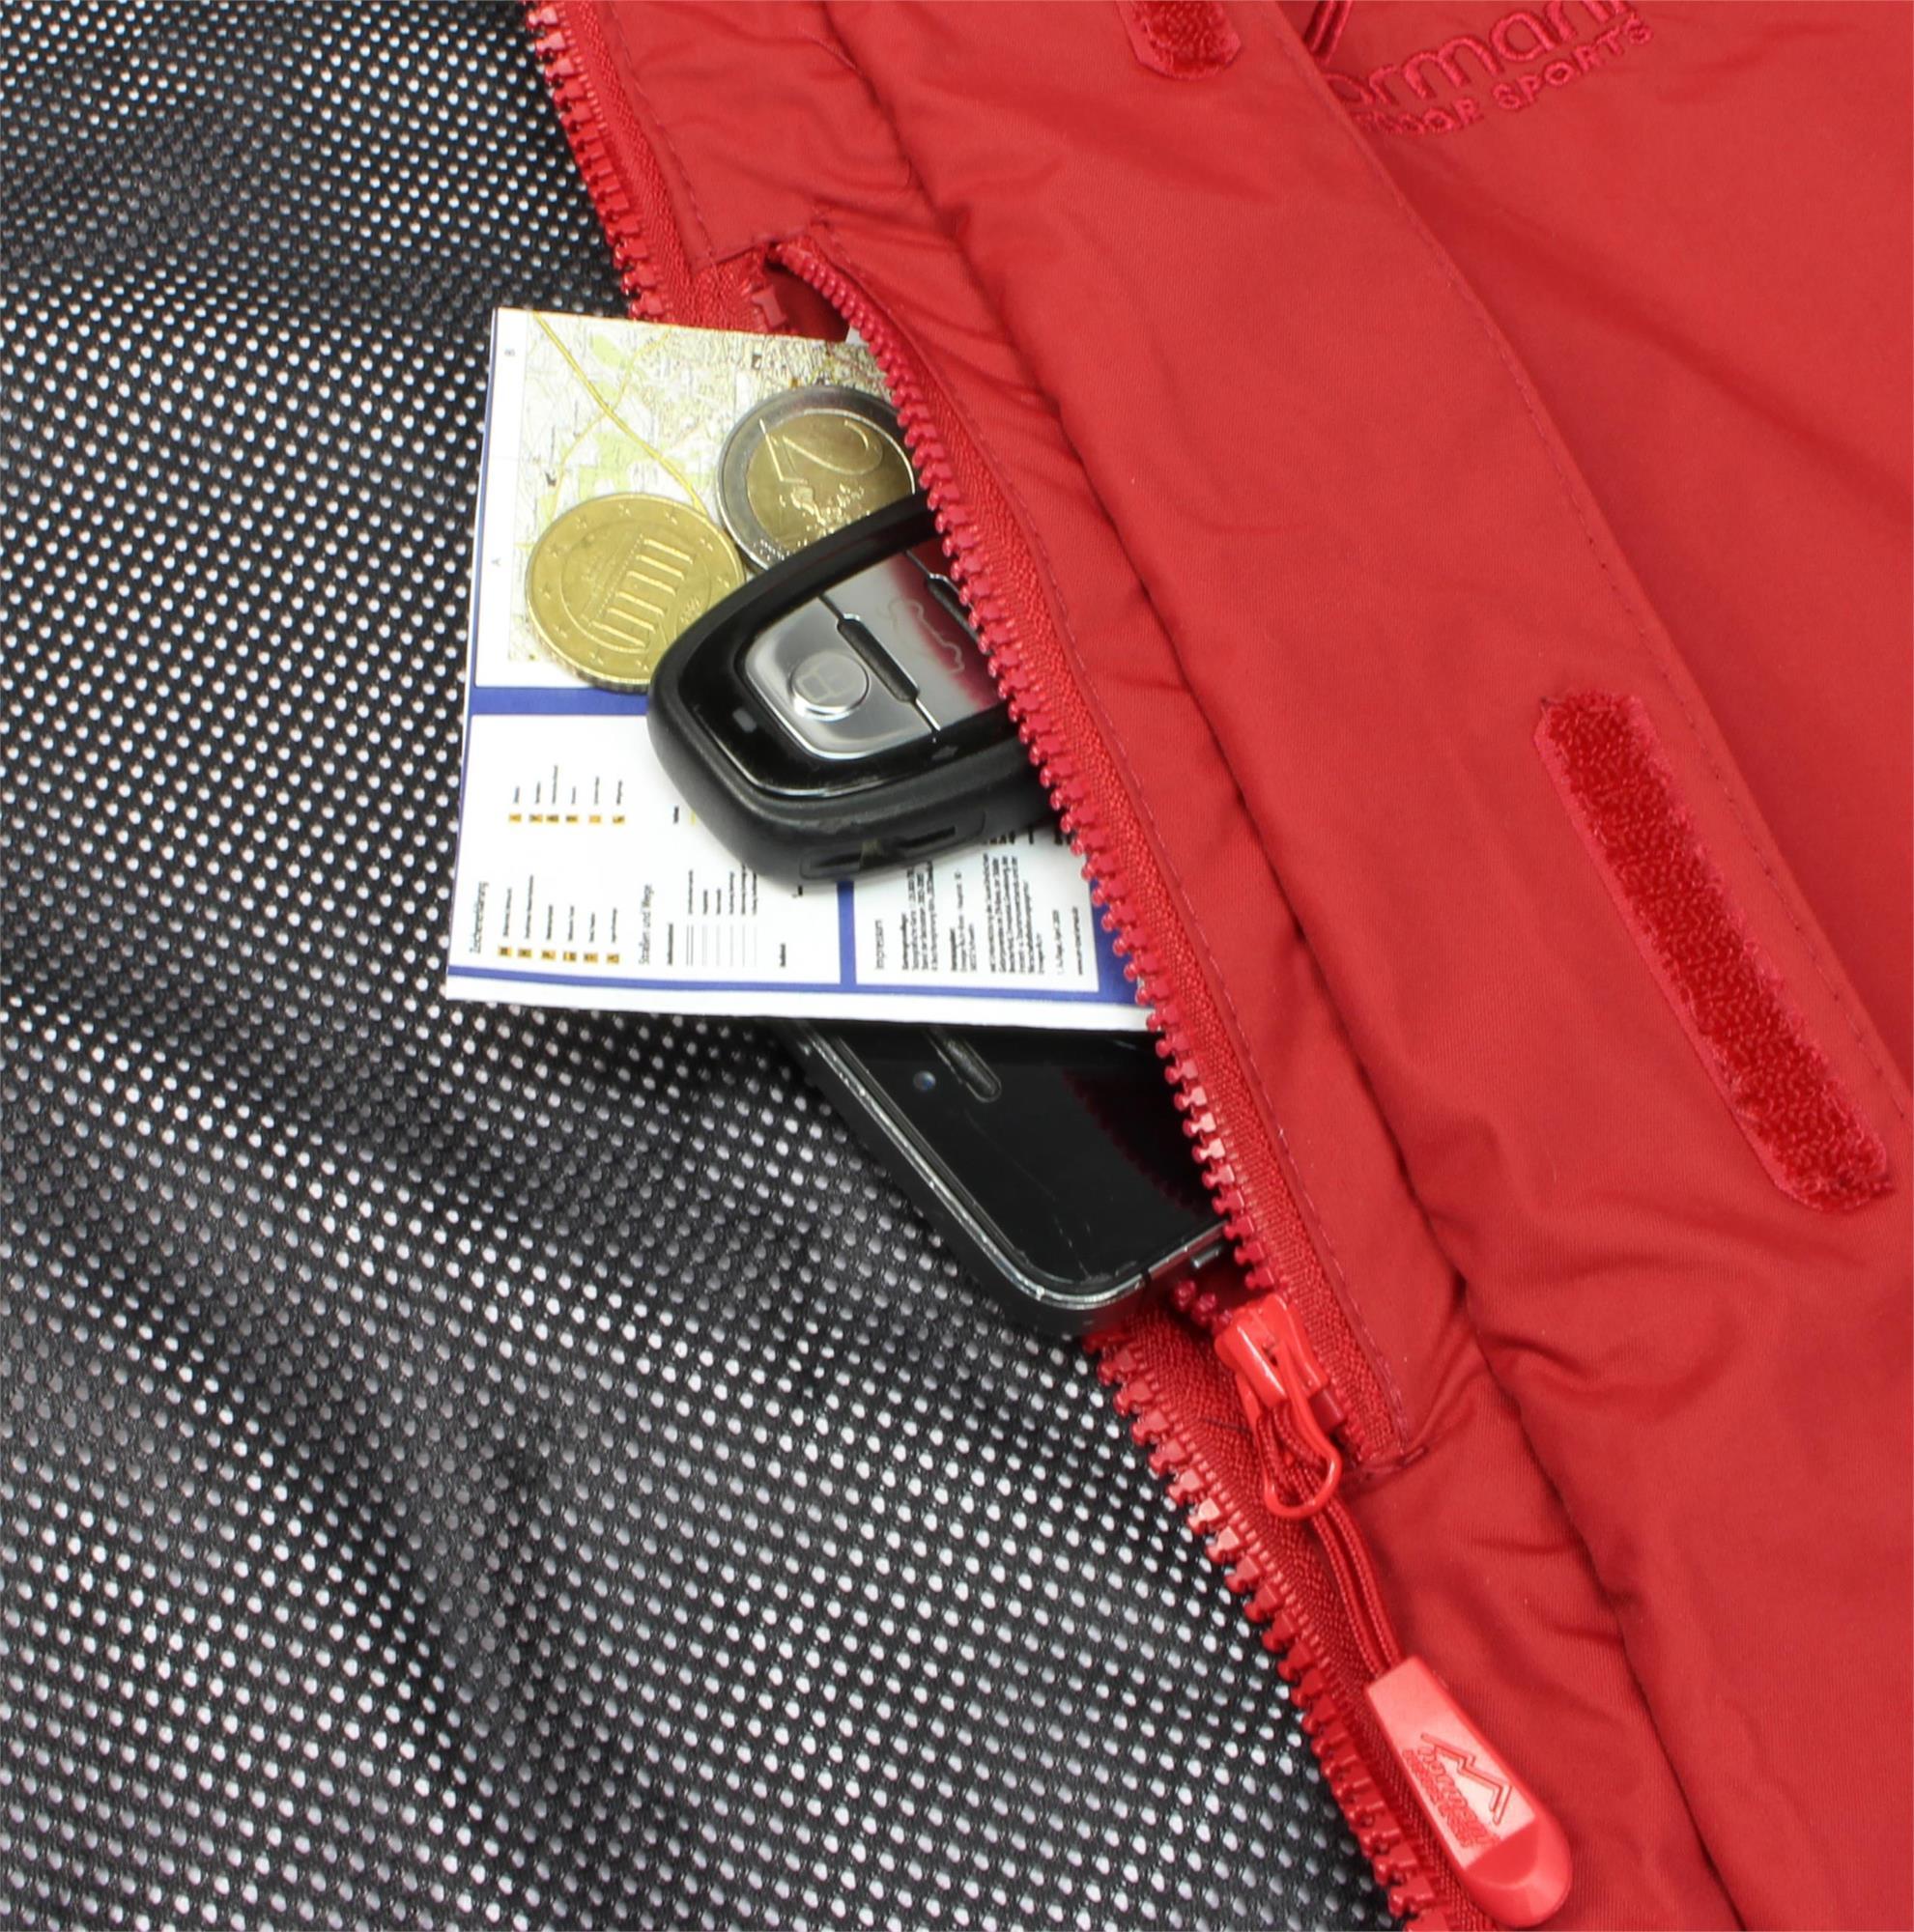 Indexbild 20 - Damen-Jacke Hardshelljacke Übergangs-Regenjacke mit Kapuze Wassersäule 10.000mm